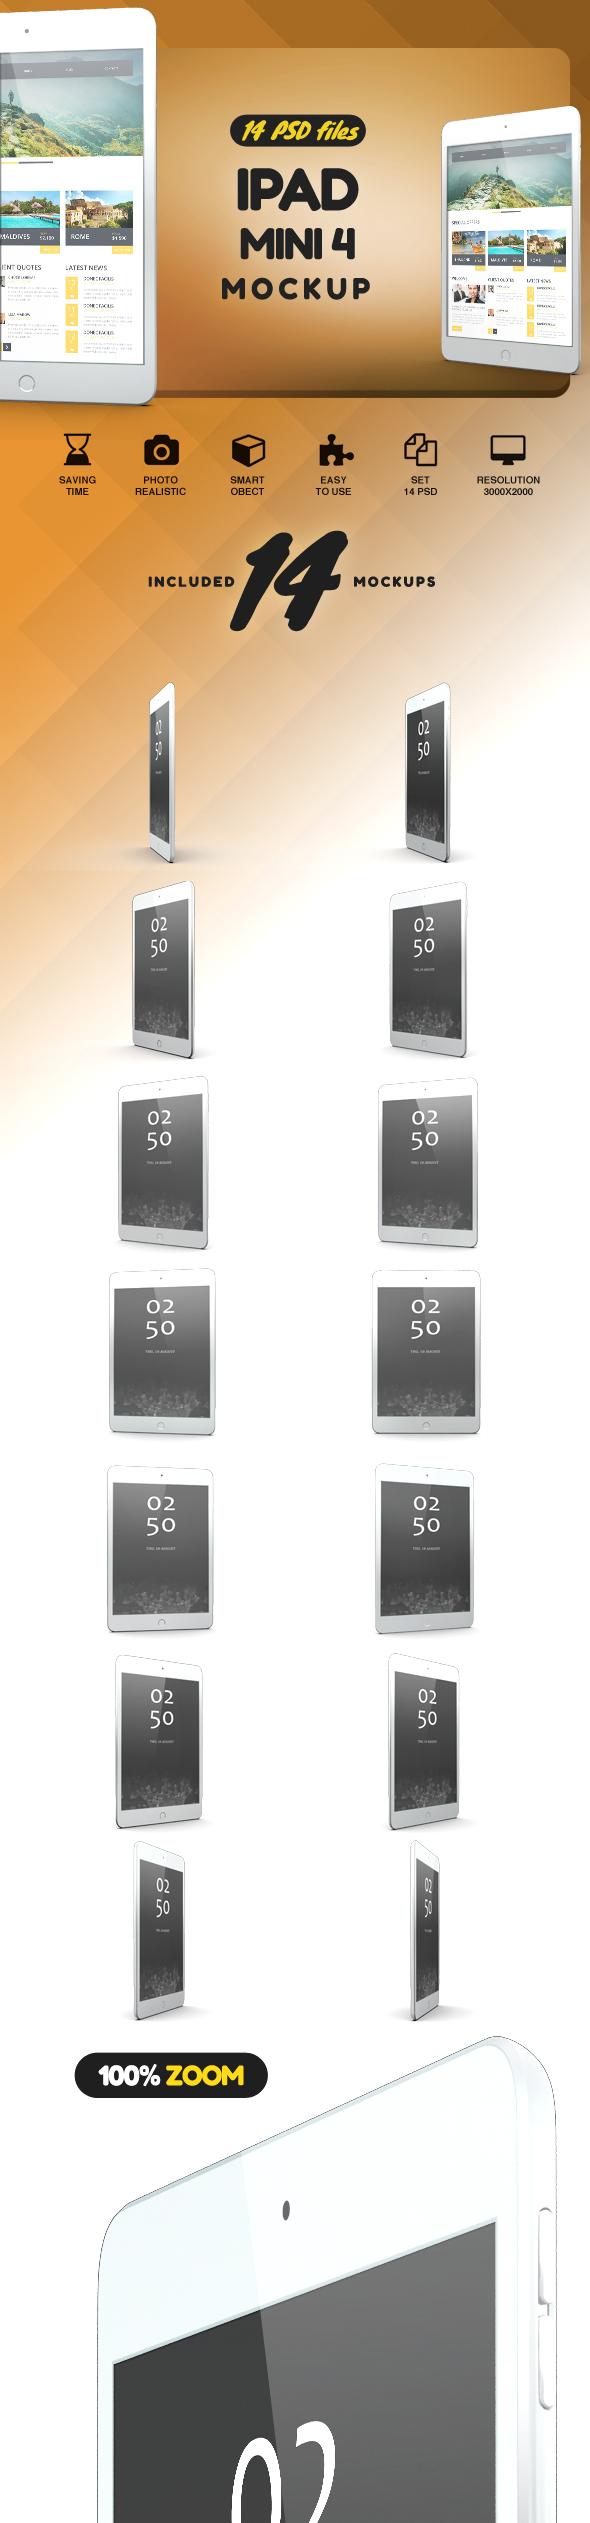 iPad Mini 4 Mock-up example image 2